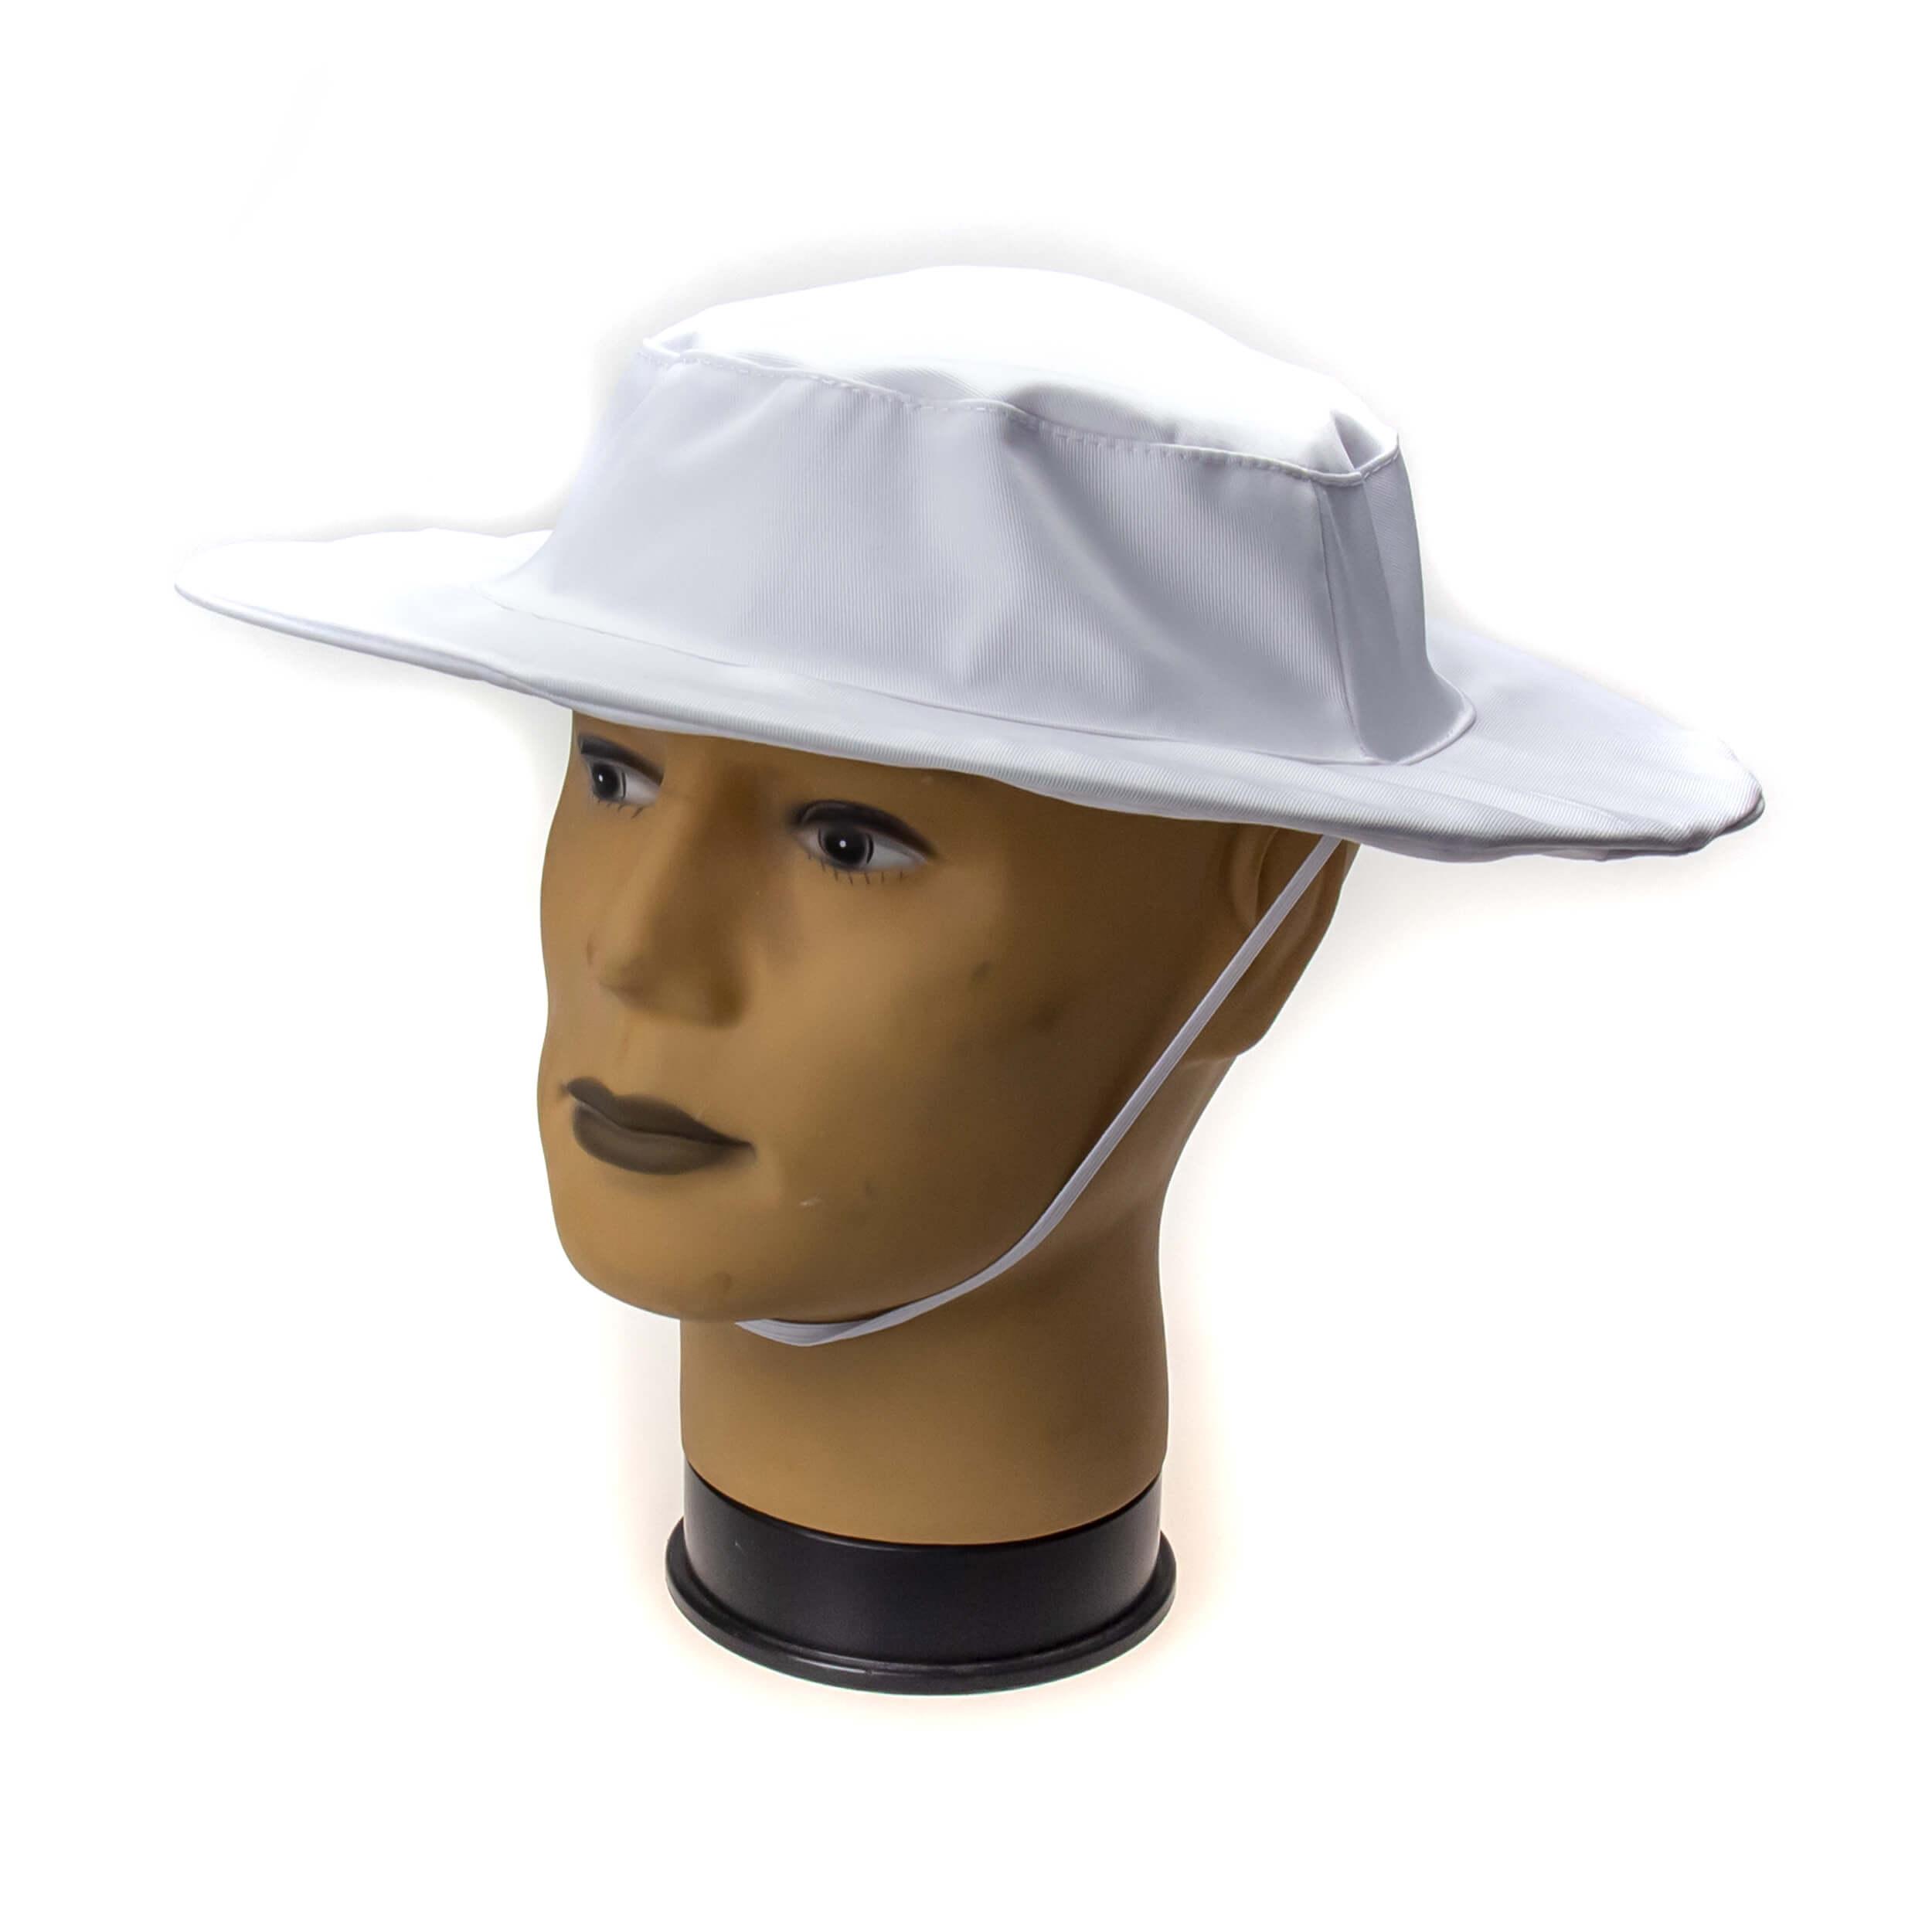 Шляпа пчеловода тканевая D-320 фото